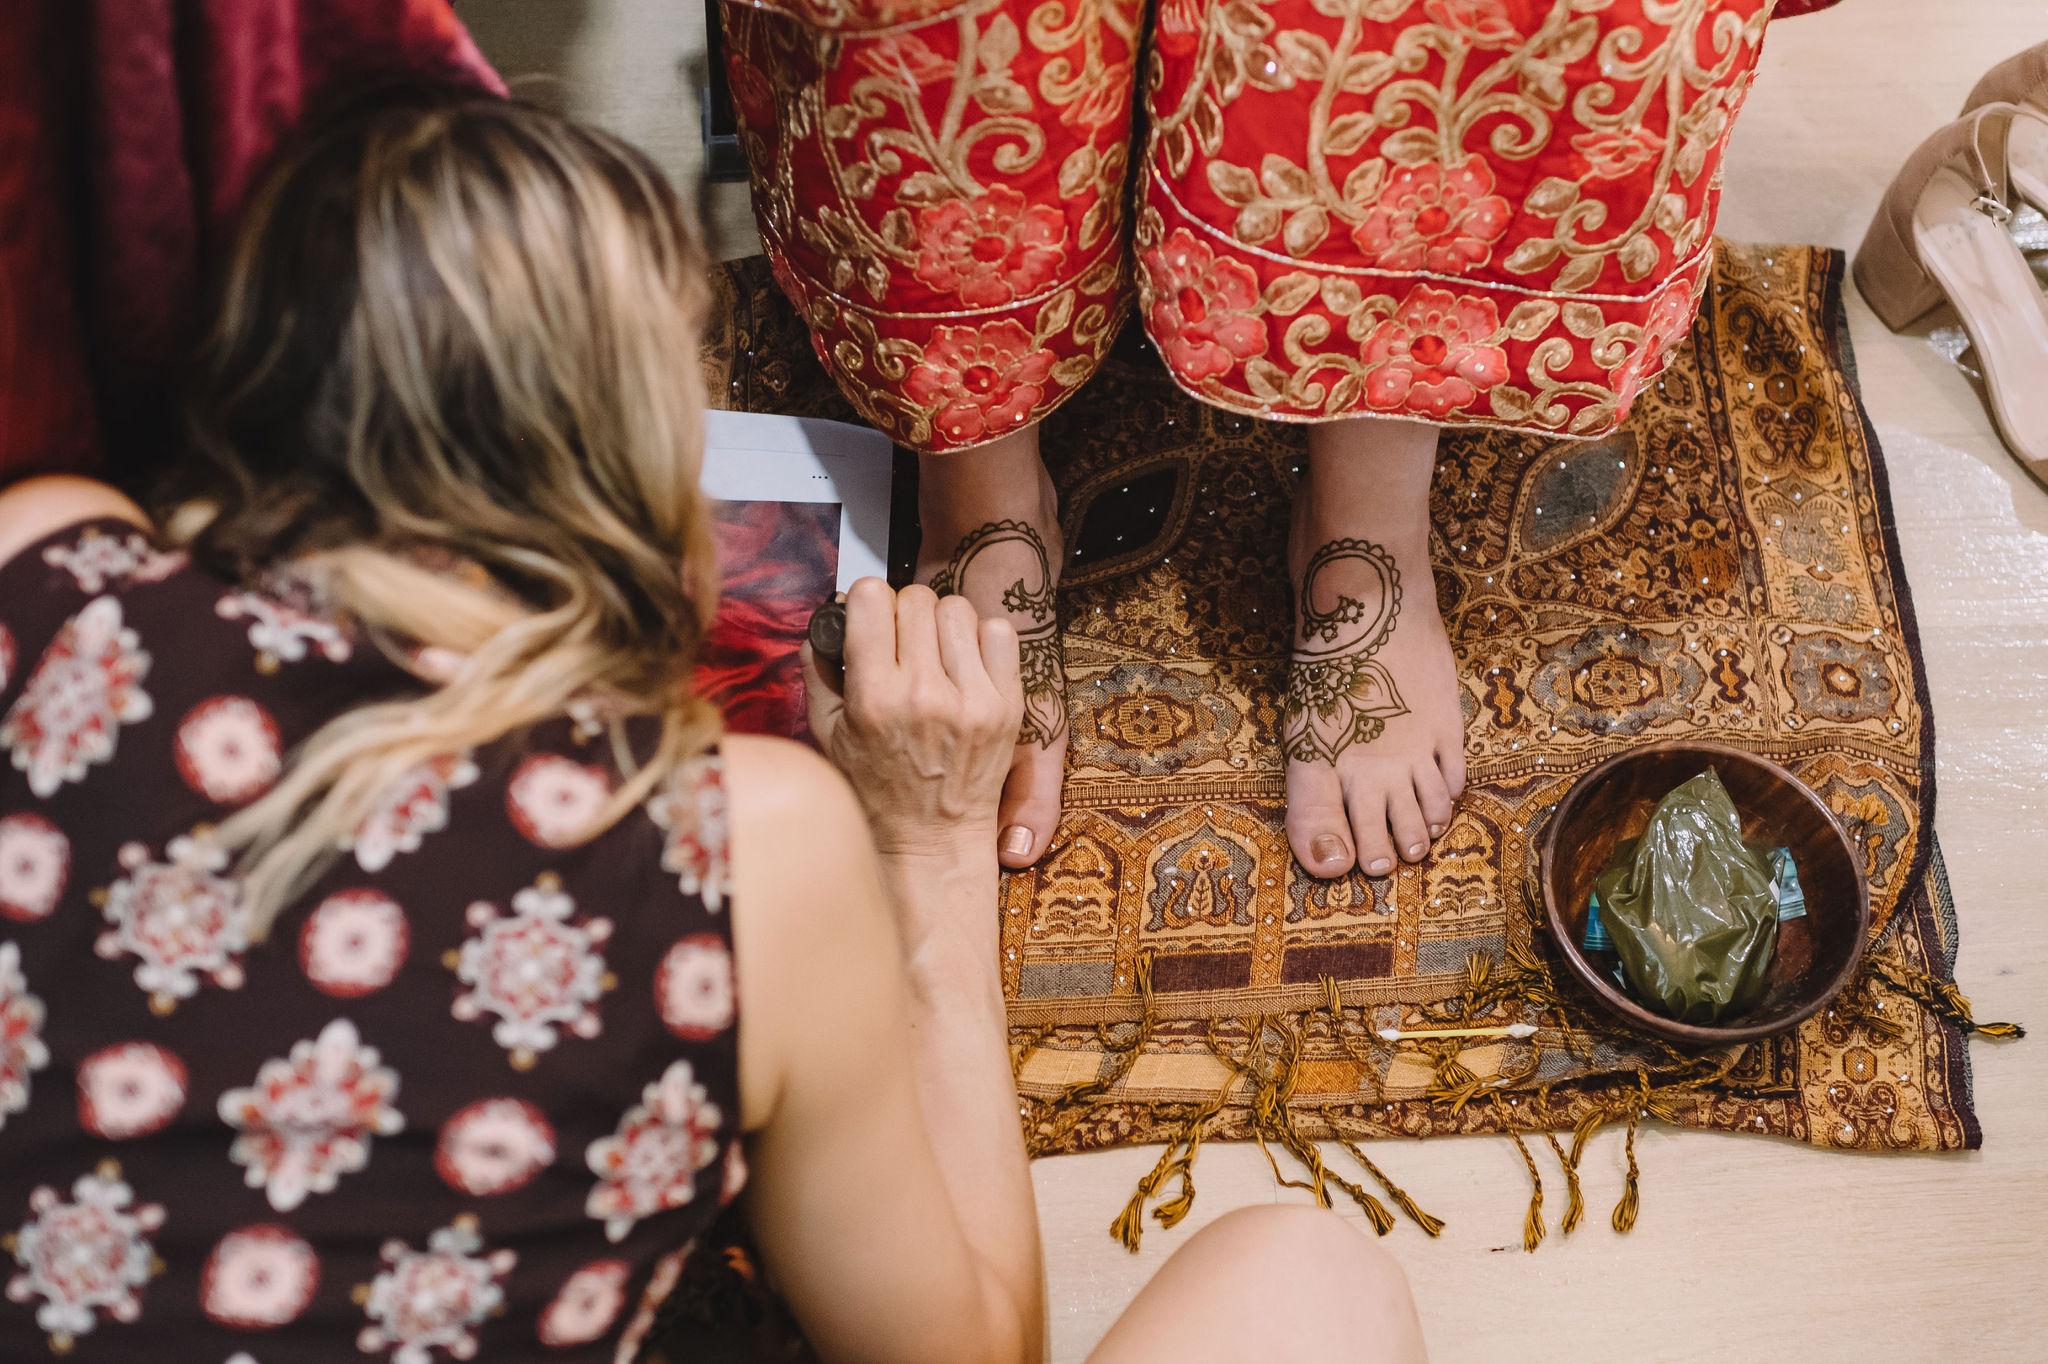 Laura Sheffield of New Orleans Henna applies Henna on Rachel's feet in intricate designs.